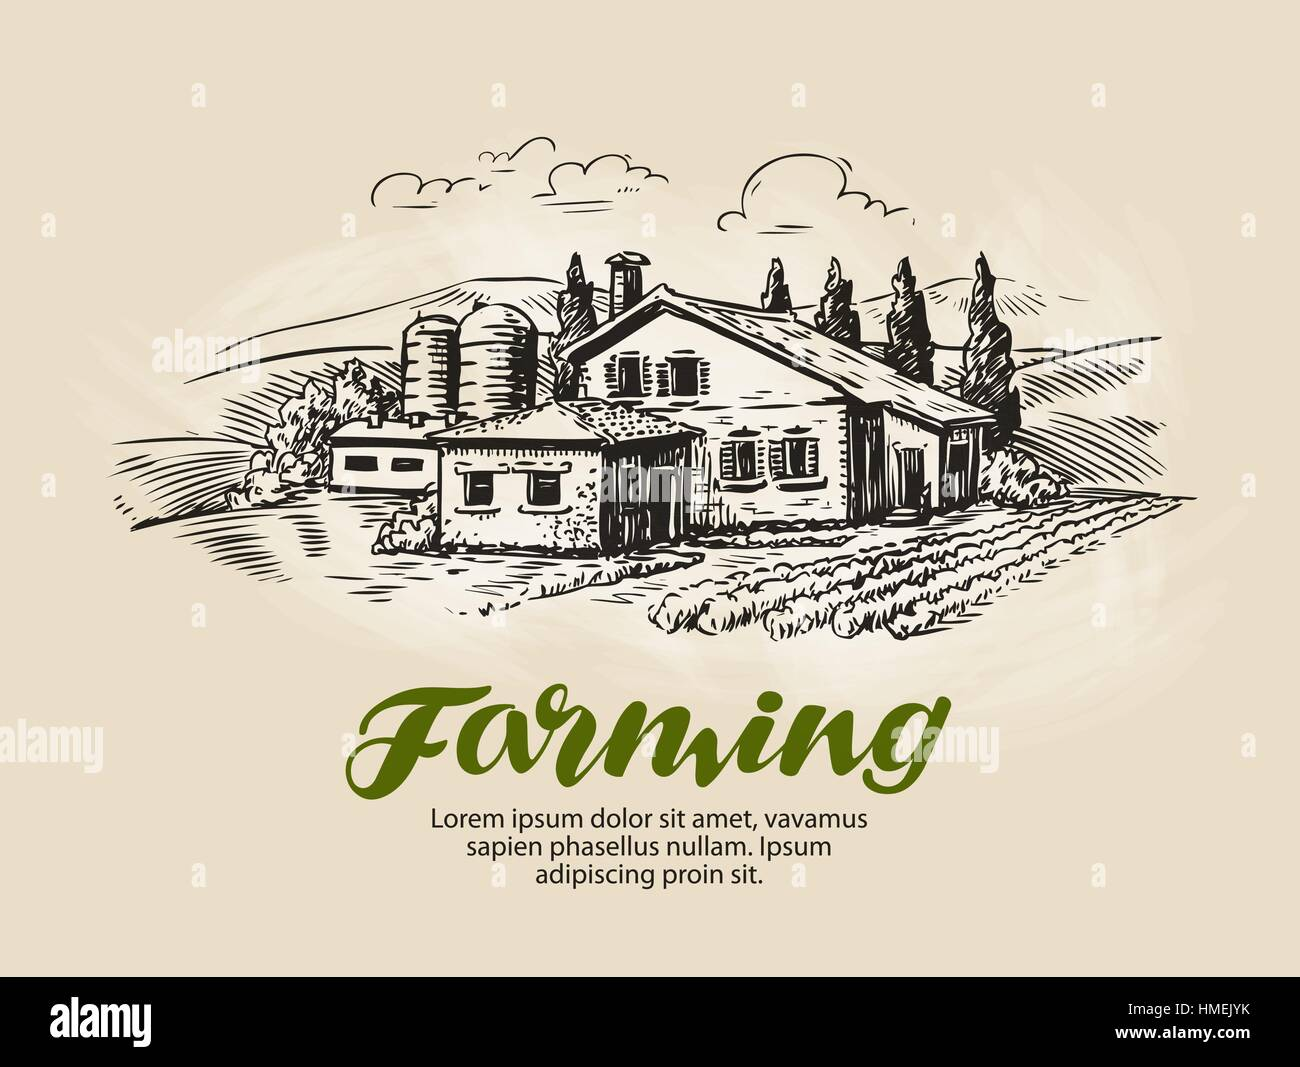 Cottage, country house sketch. Farm, rural landscape, agriculture, farming vector illustration - Stock Image